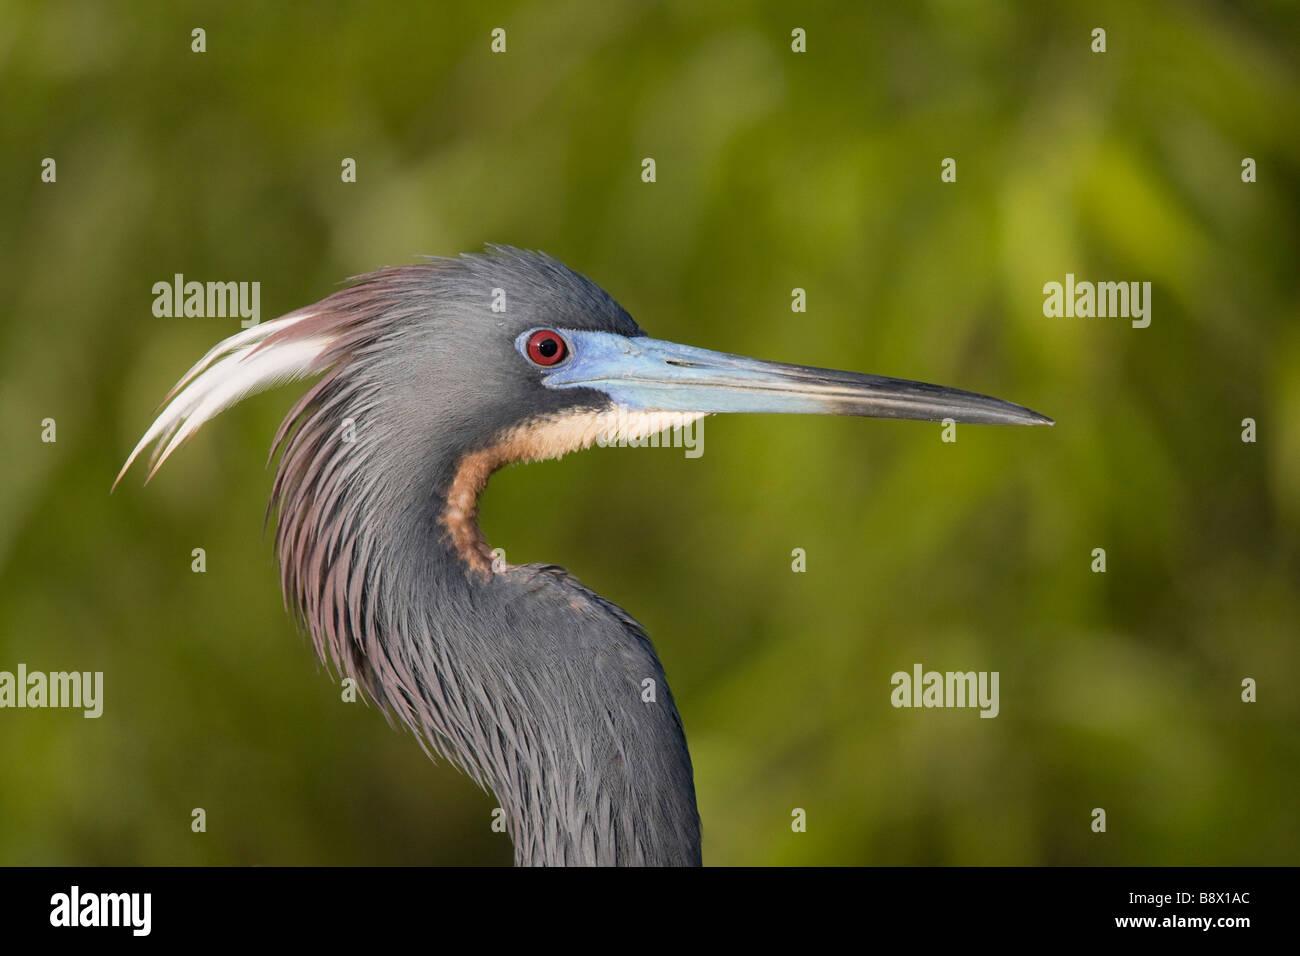 Close-up of a Tricolored heron (Egretta tricolor) - Stock Image